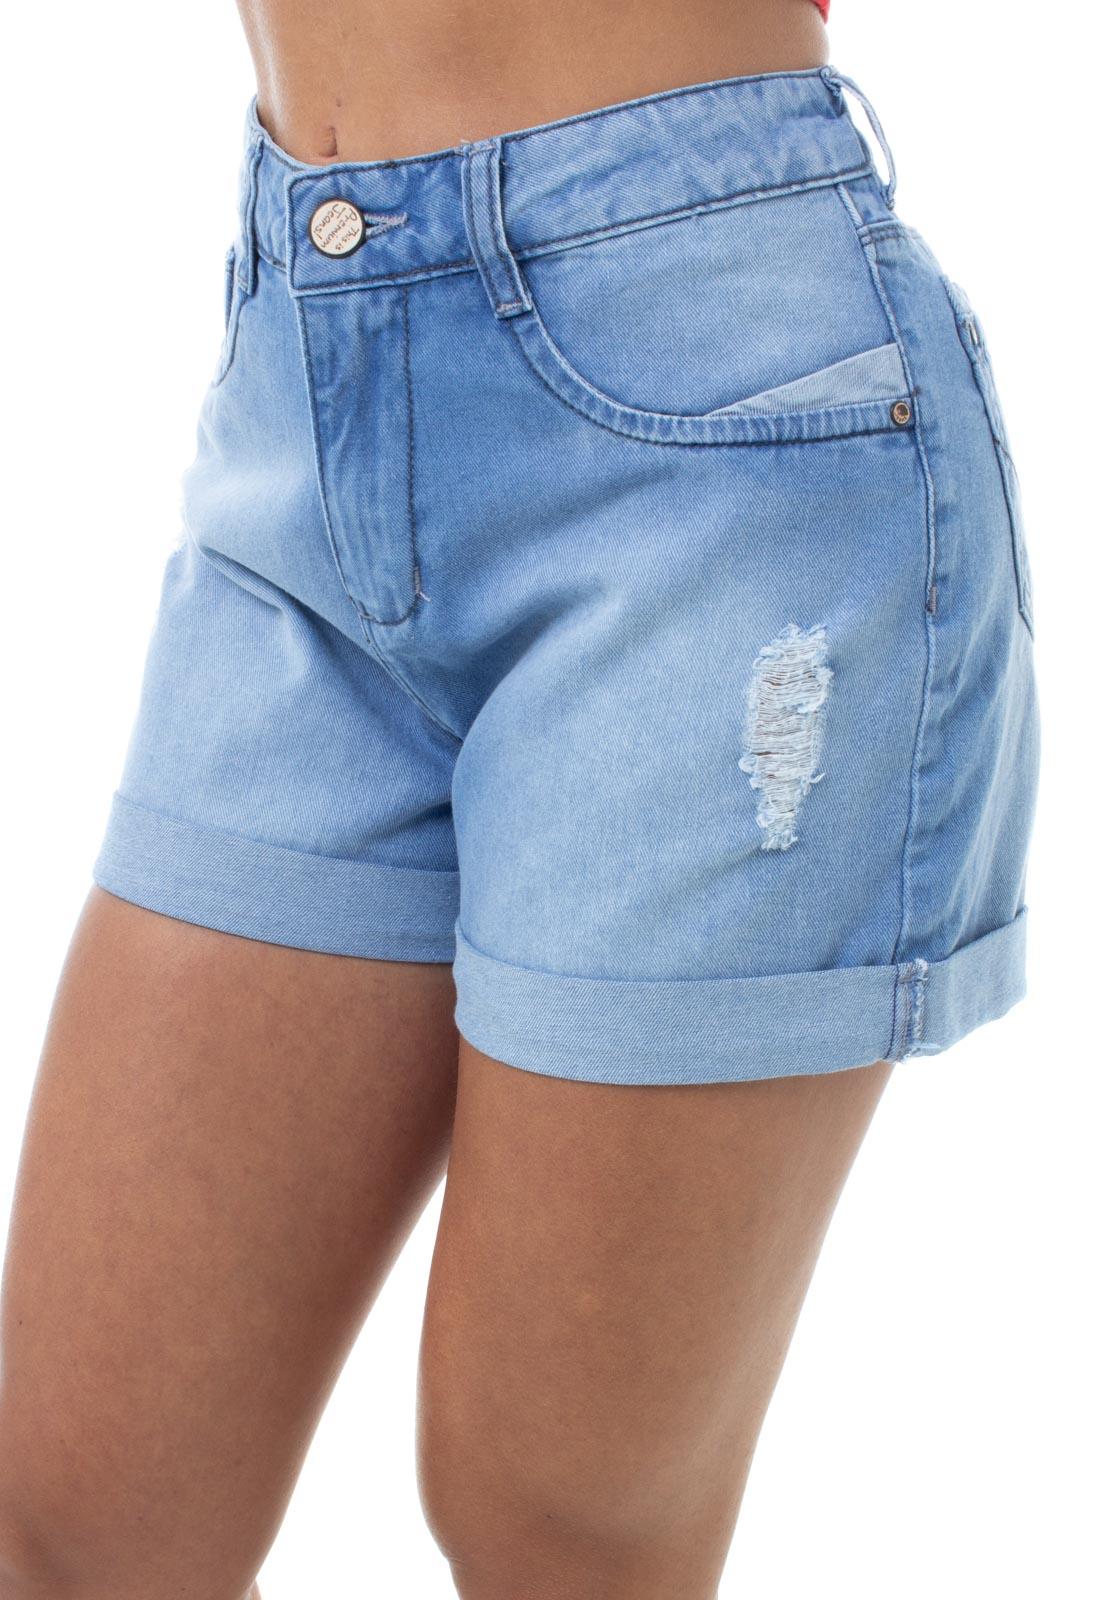 Shorts Jeans Feminino Curto Barra Dobrada Crocker - 48146  - CROCKER JEANS